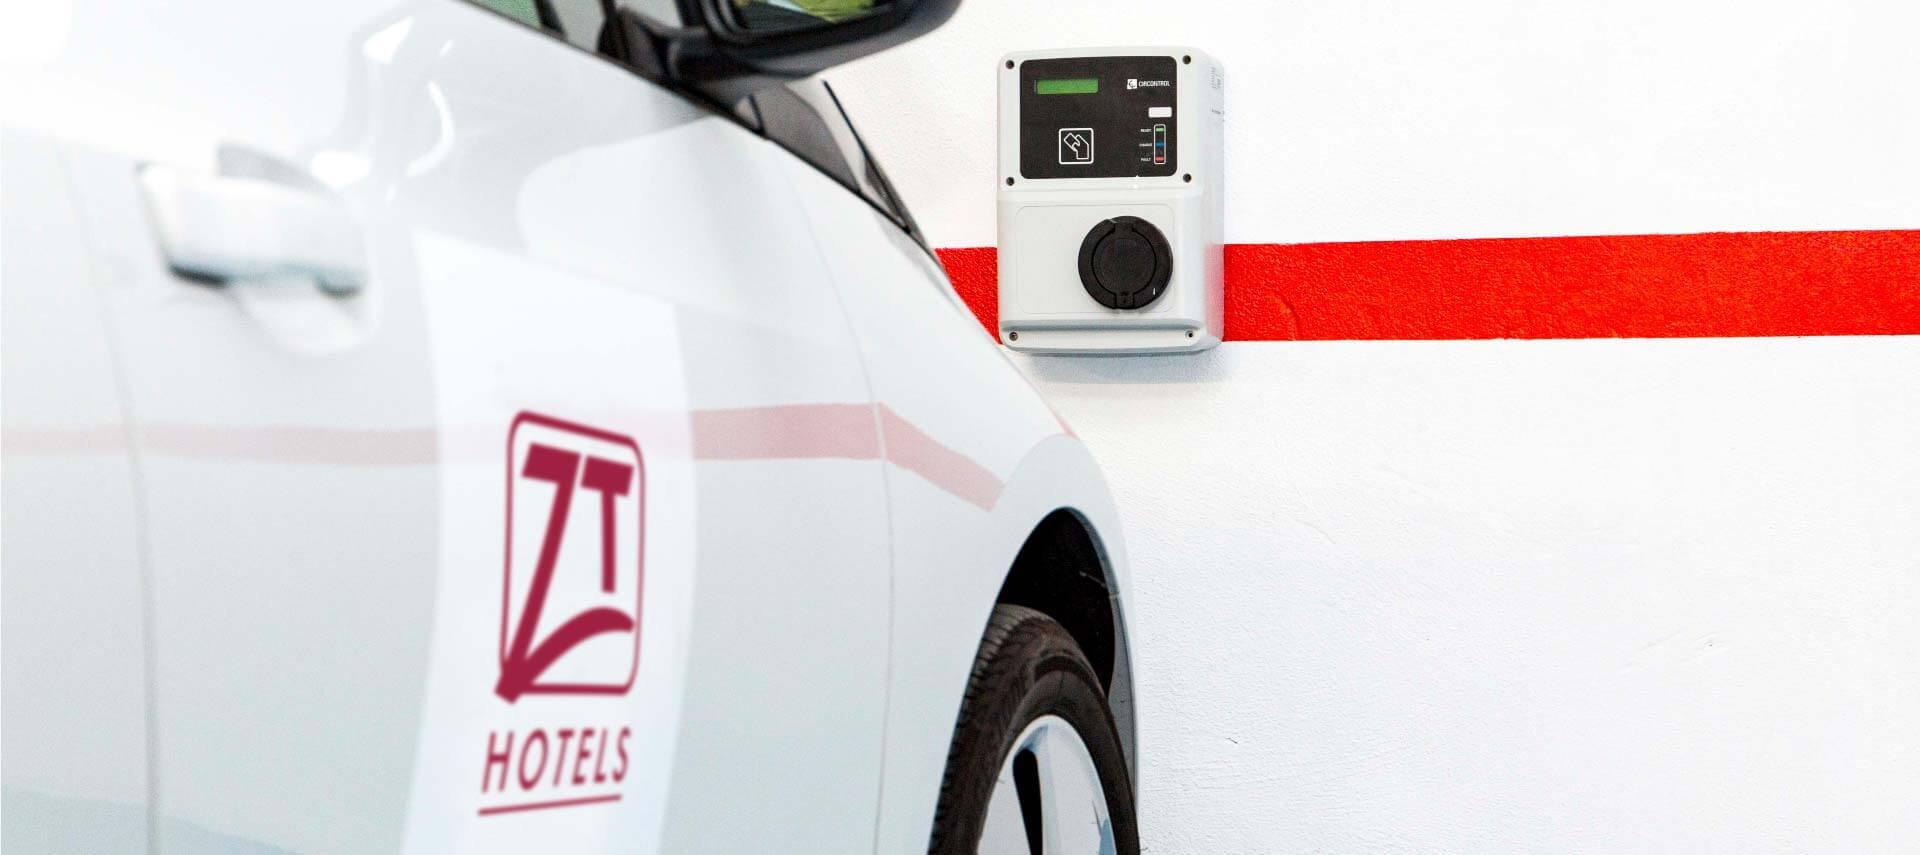 Alquilar coche eléctrico en Barcelona